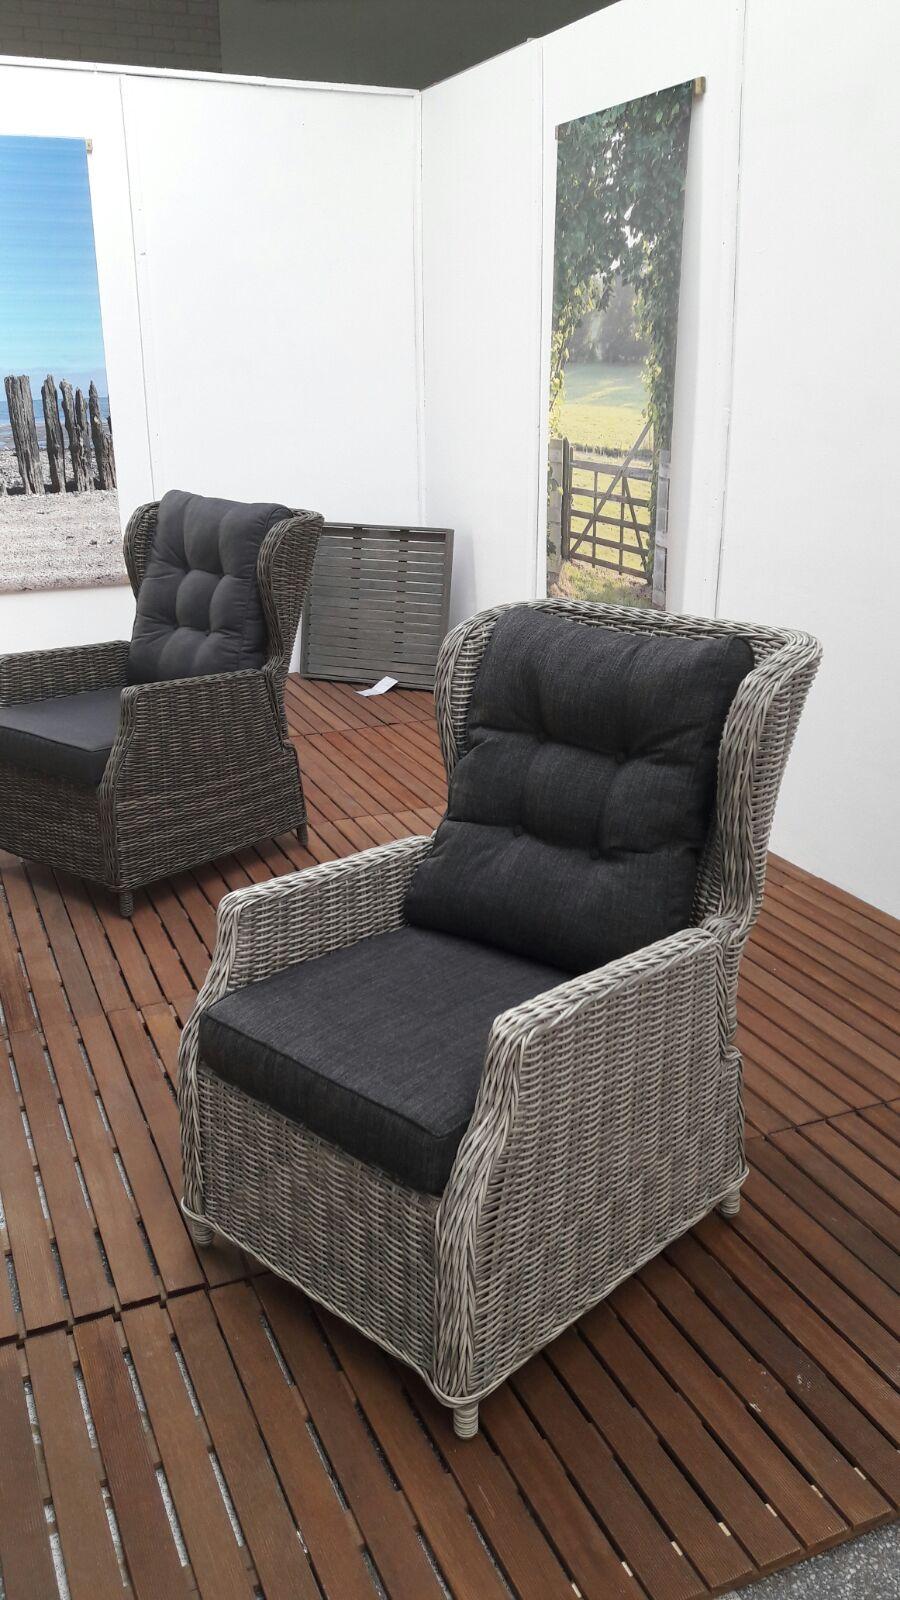 valencia verstellbarer lounge sessel hellgrau meliert garten m bel f r dich. Black Bedroom Furniture Sets. Home Design Ideas